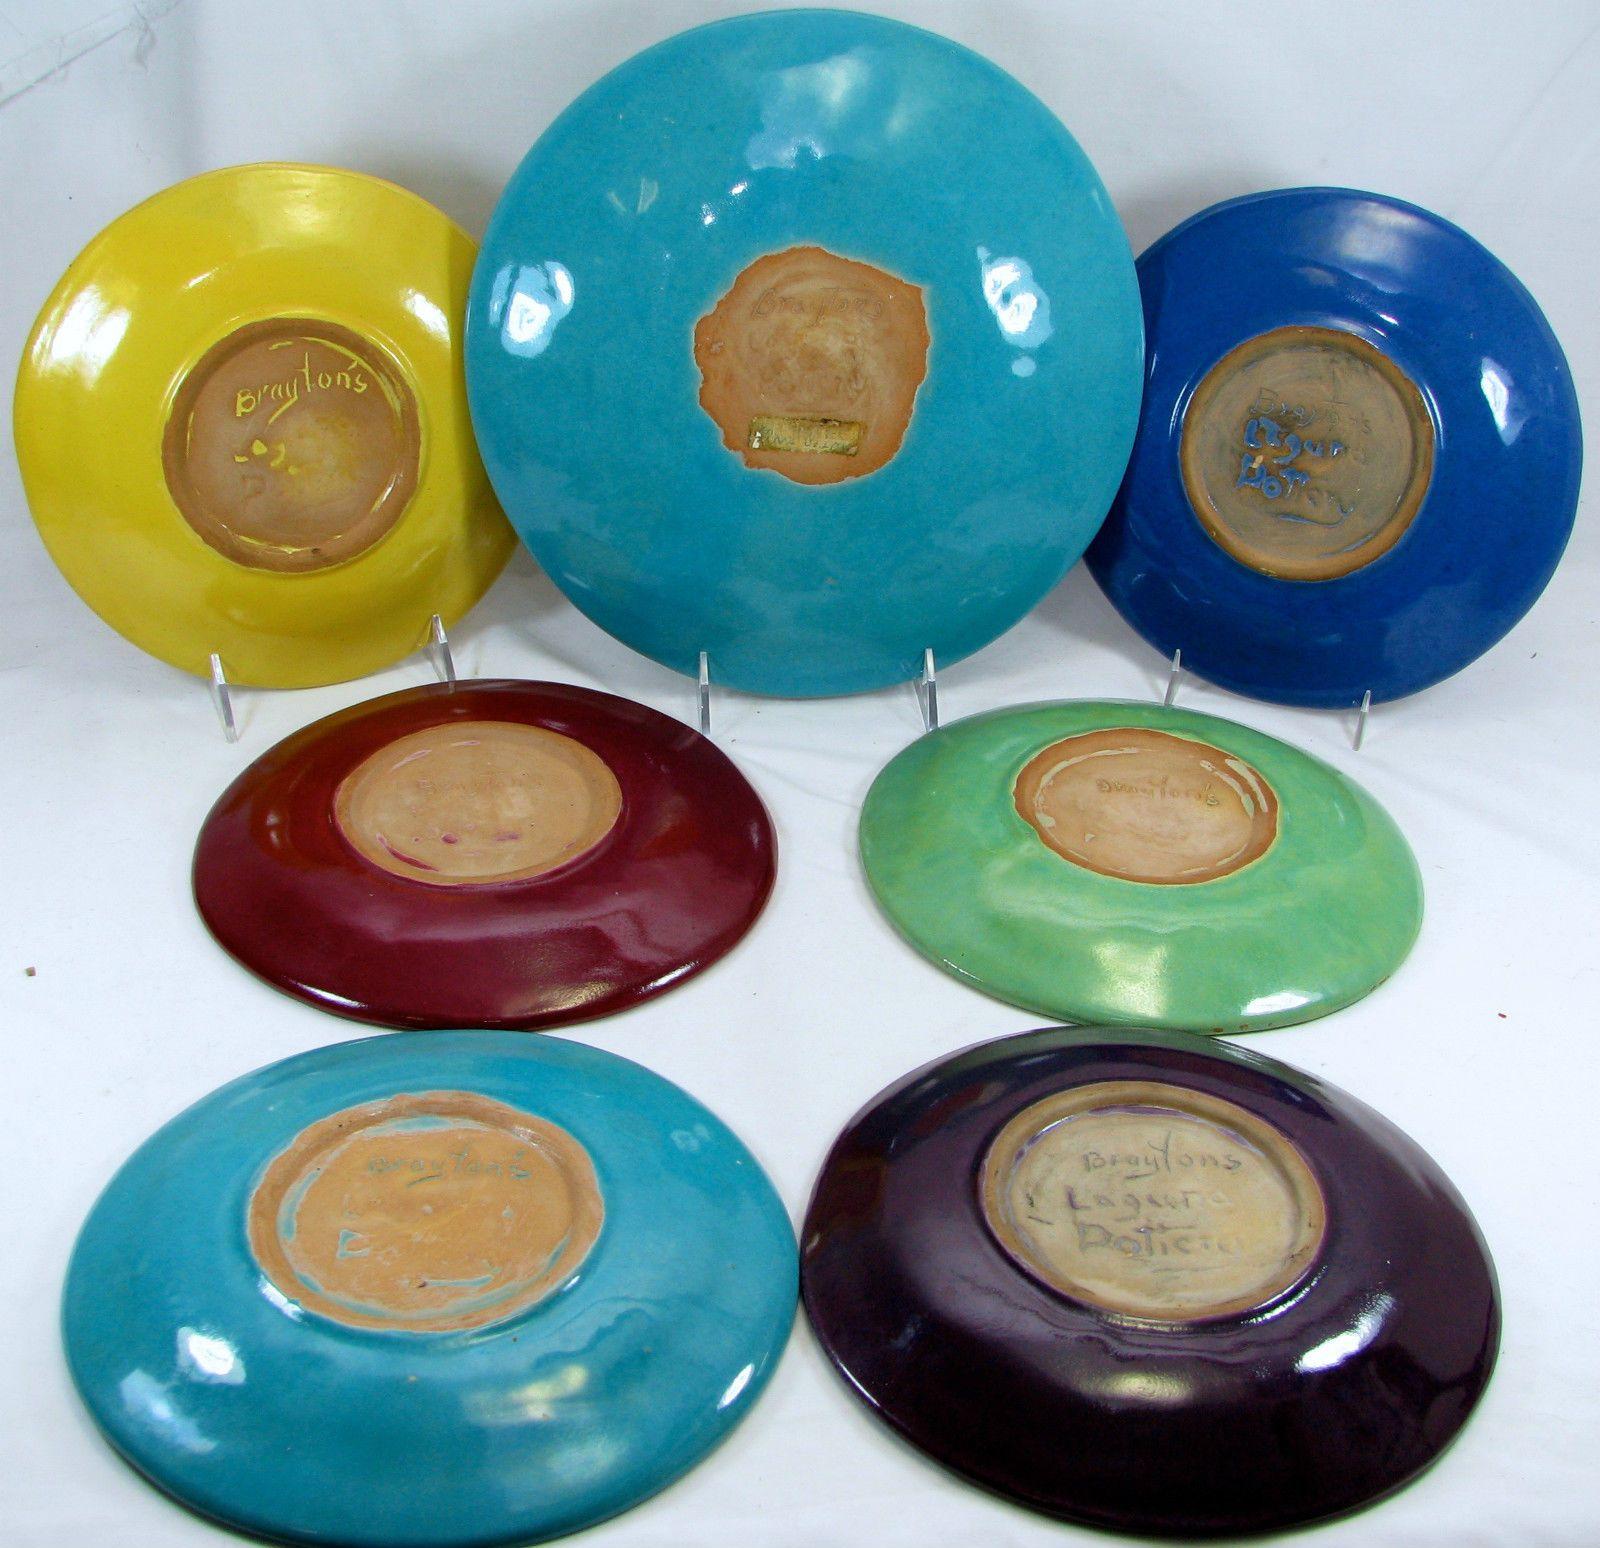 California pottery solid color dinnerware early 1930s Brayton Laguna plates each inidually signed. & California pottery solid color dinnerware early 1930s Brayton ...